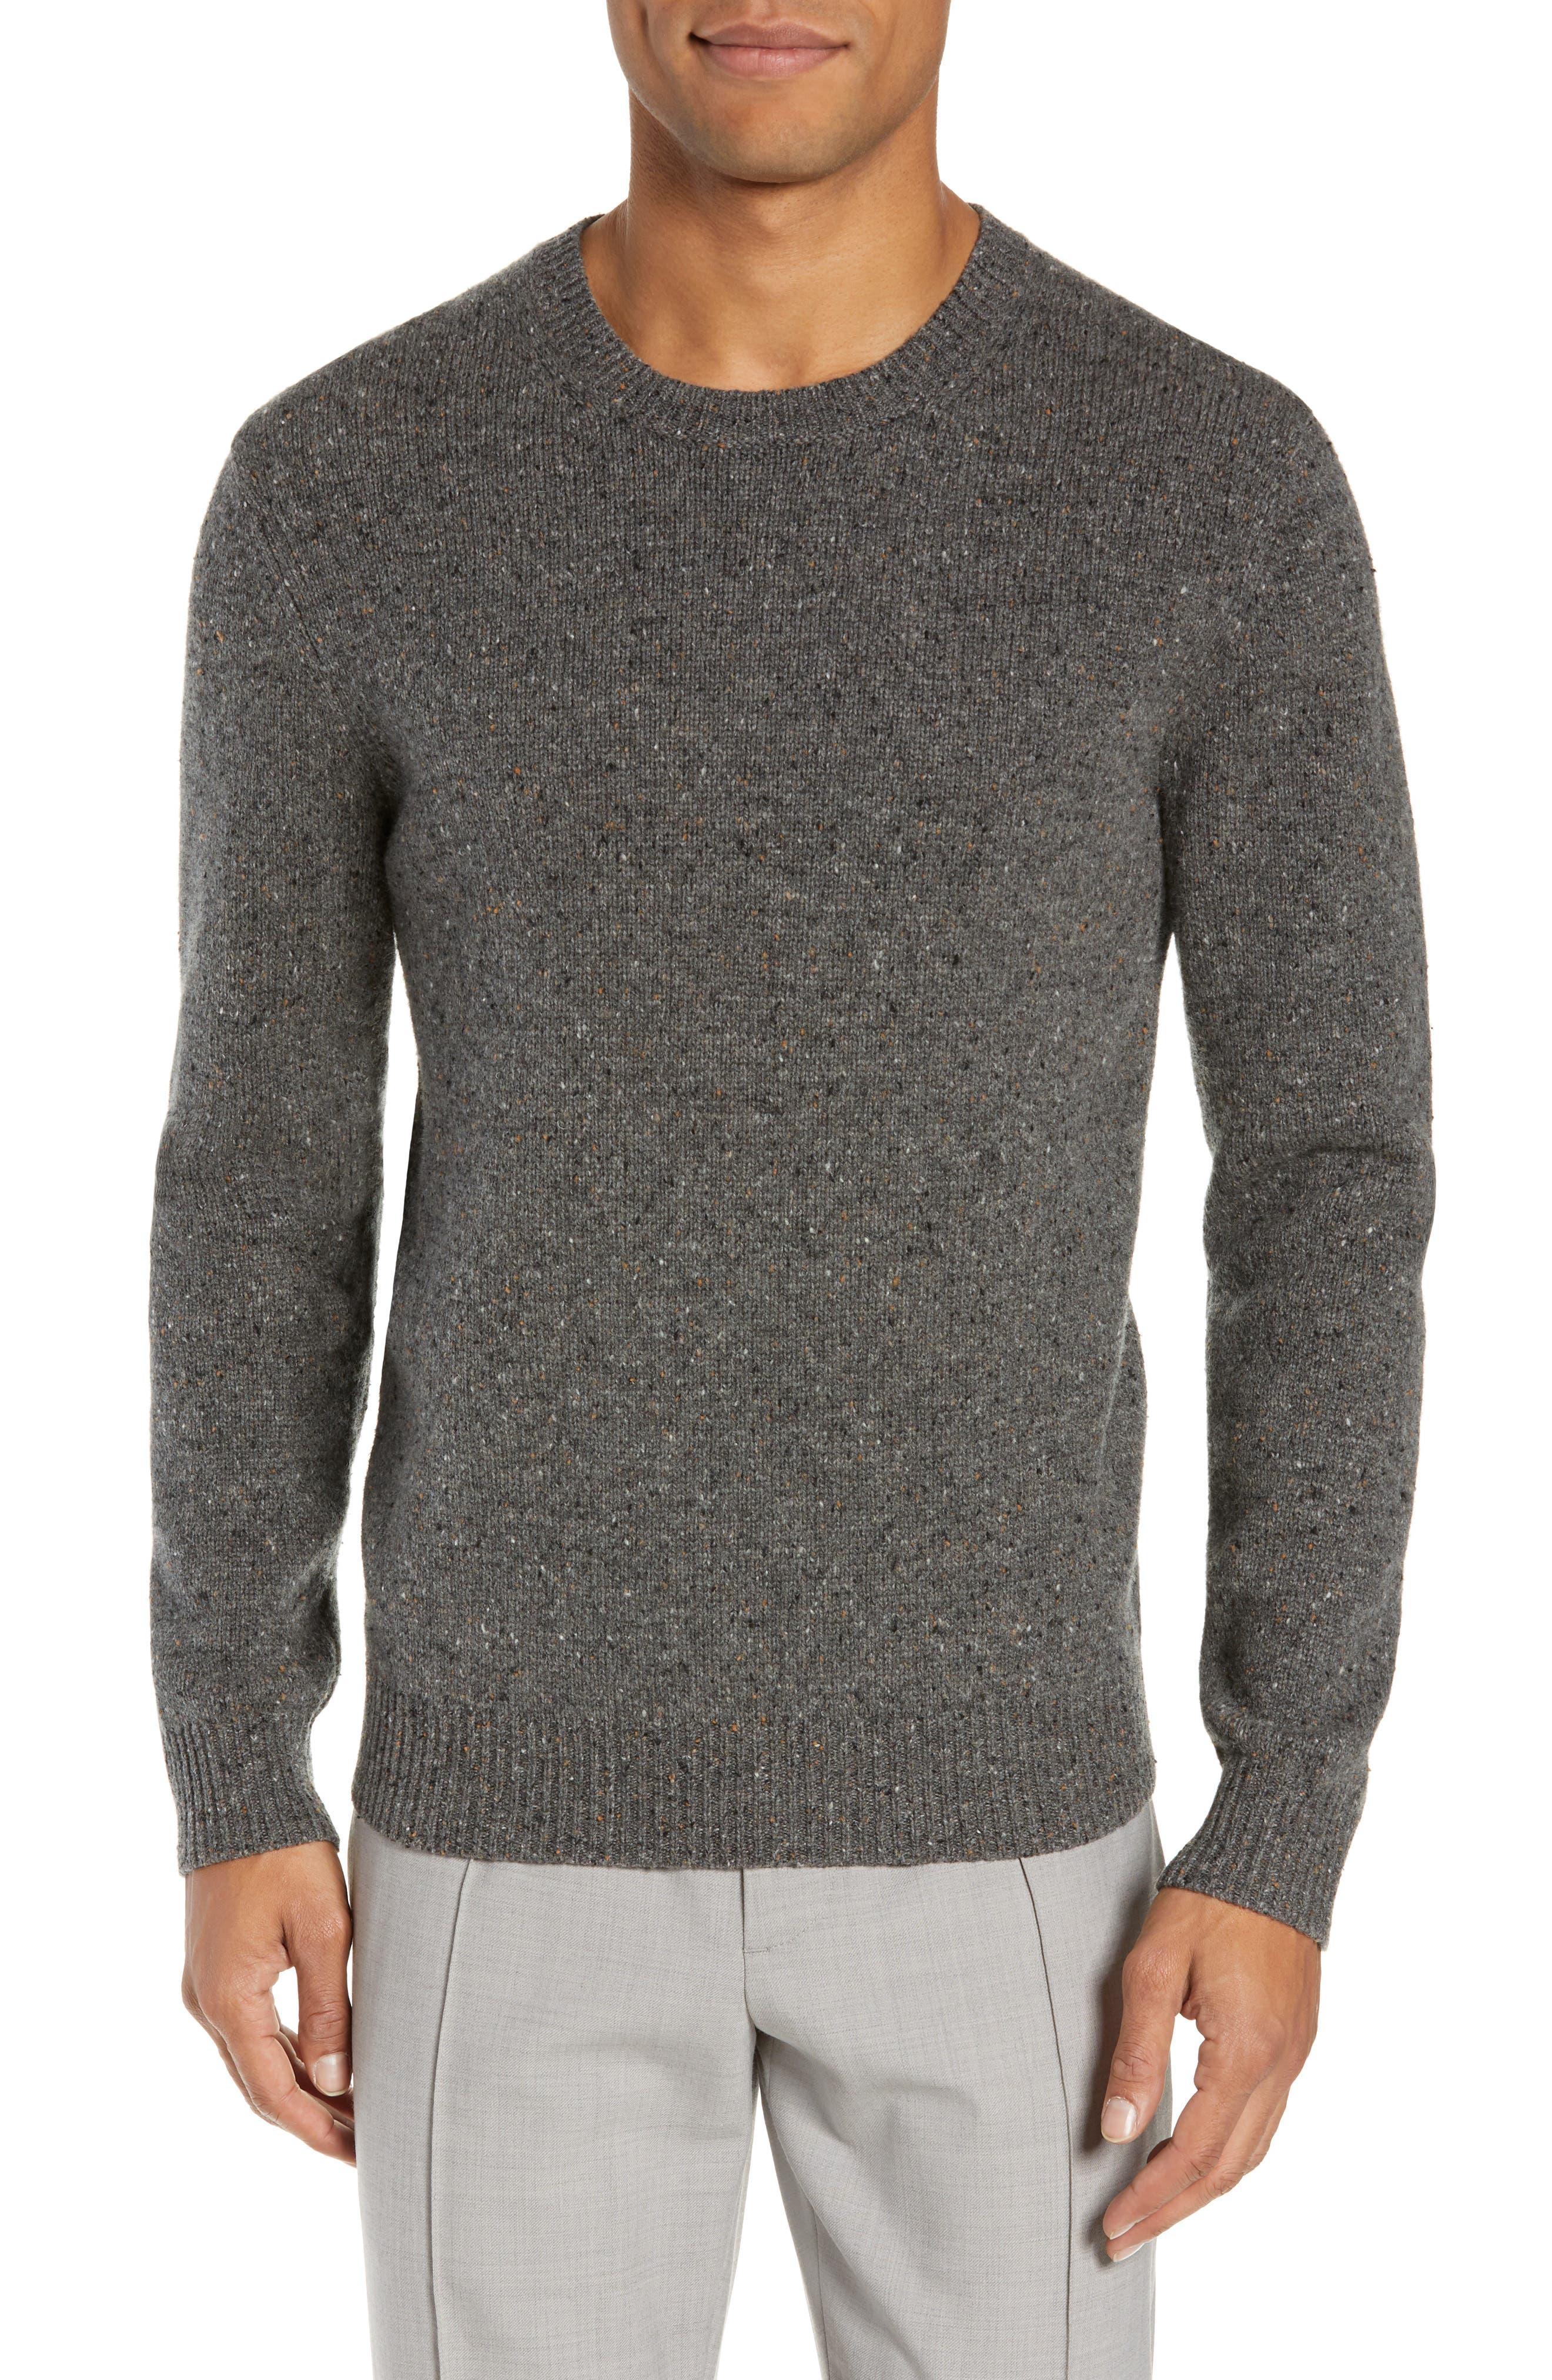 Jaxon Trim Fit Wool Sweater,                             Main thumbnail 1, color,                             GREY MULTI